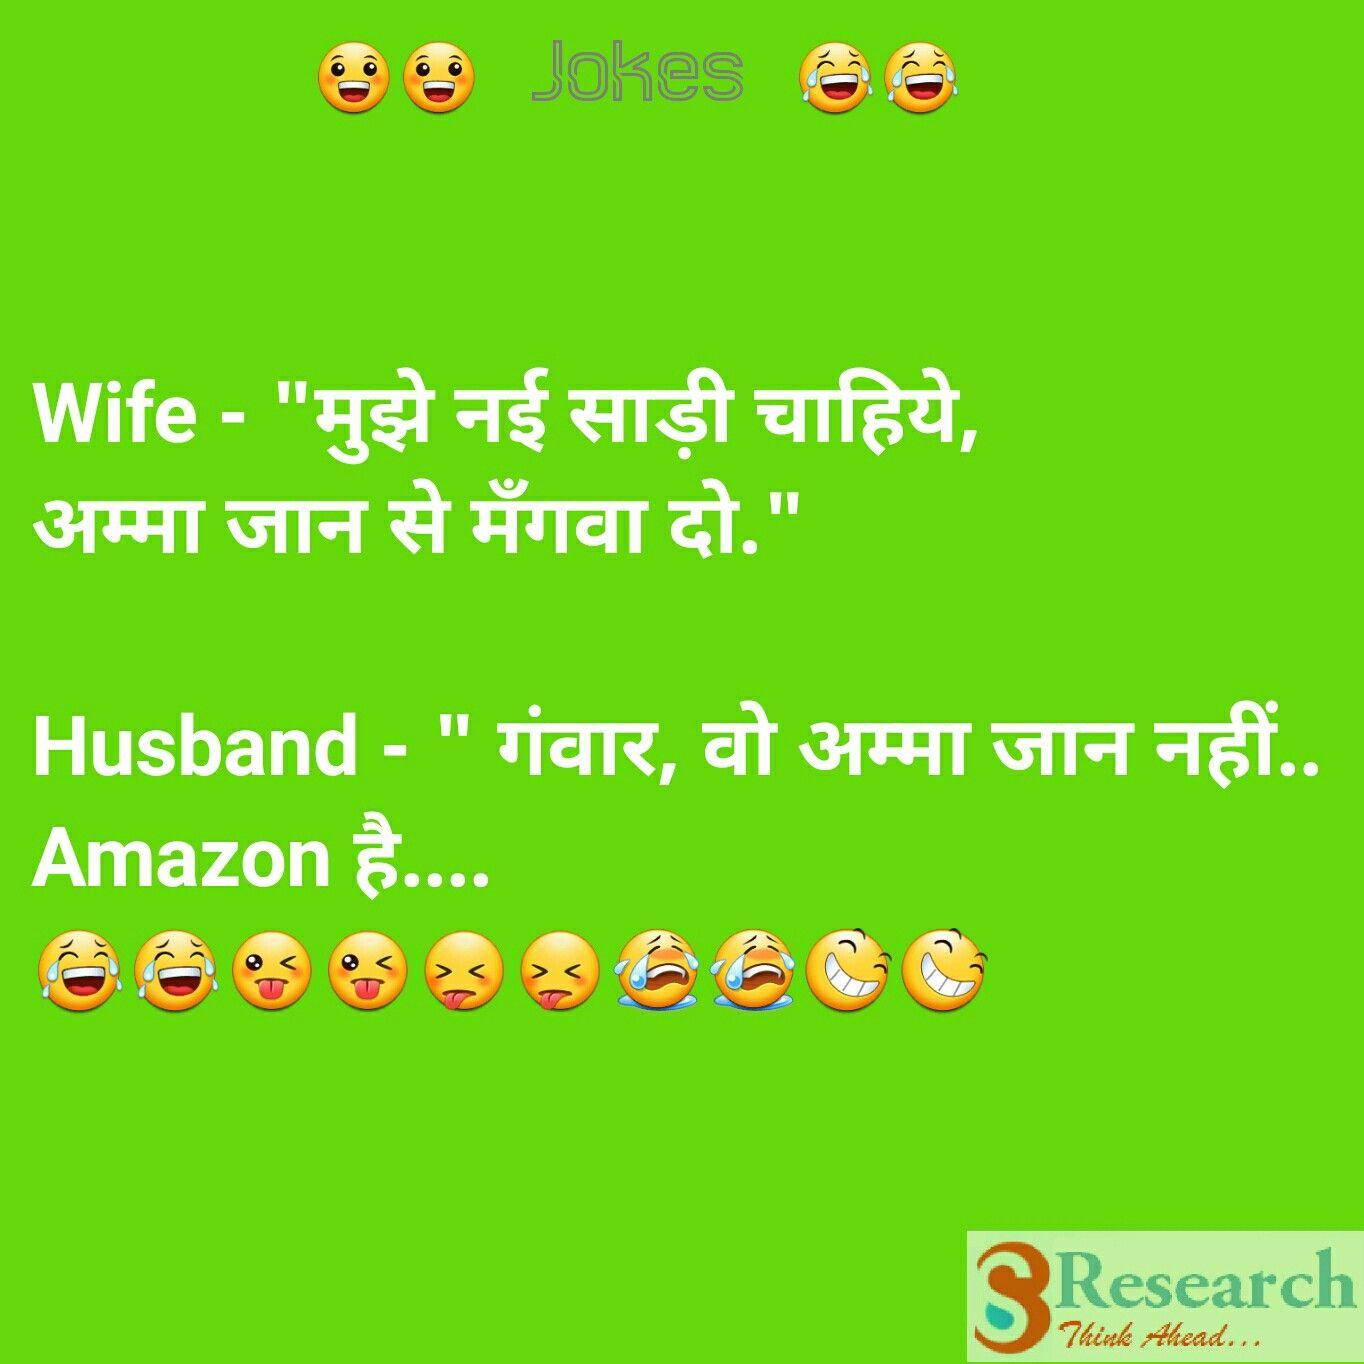 Pin By Seema Sharma On Jokes Hindi Good Morning Quotes Funny Good Morning Quotes Funny Picture Quotes